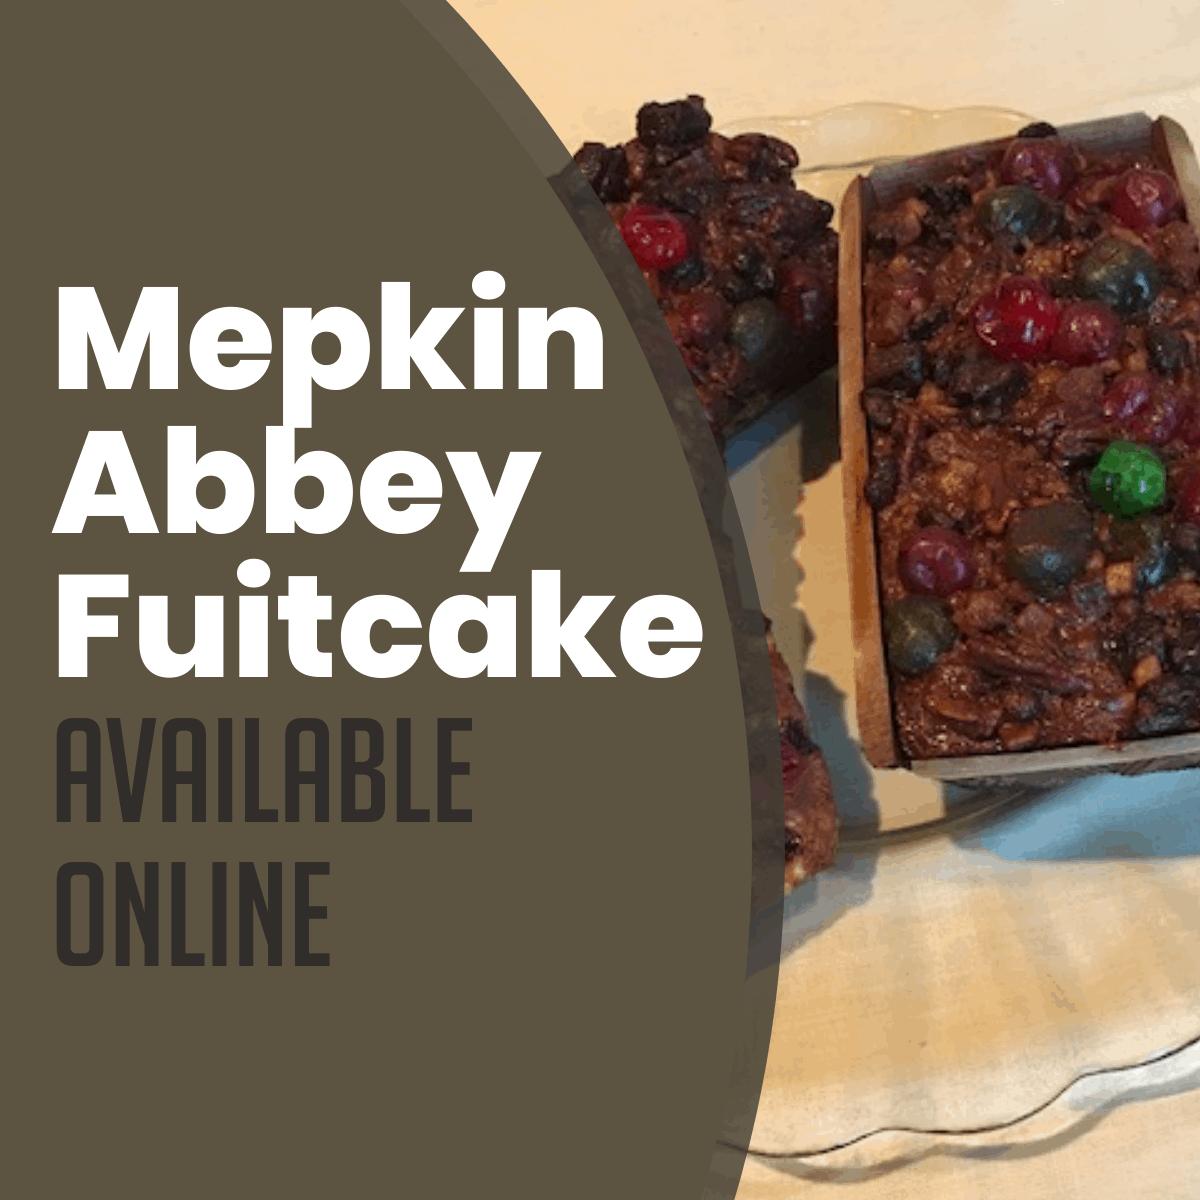 Mepkin Abbey Reception Center/Gift Shop